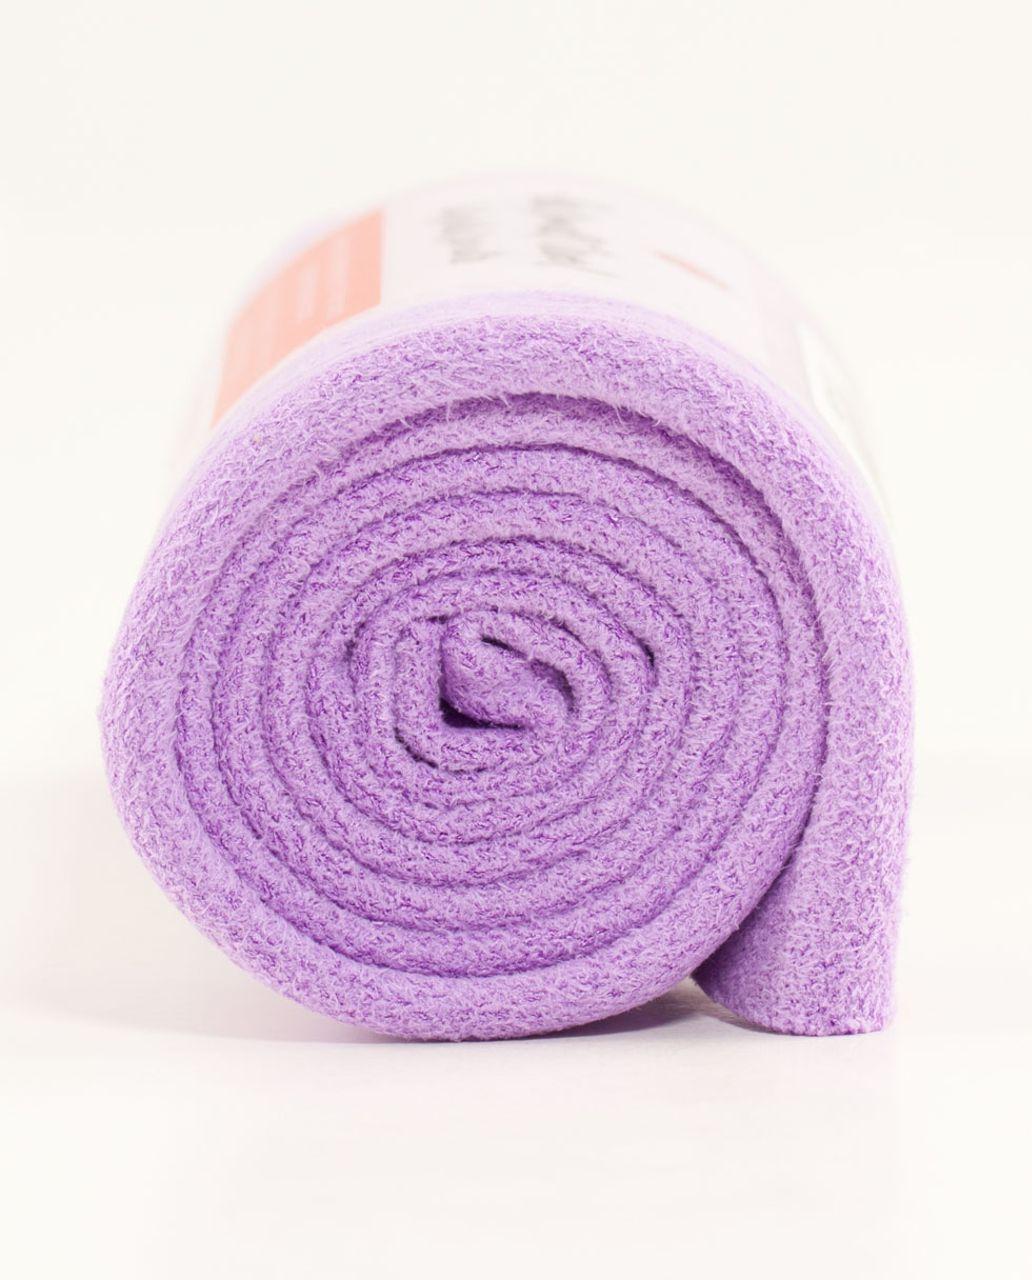 Lululemon The (Small) Towel - Groovy Grape